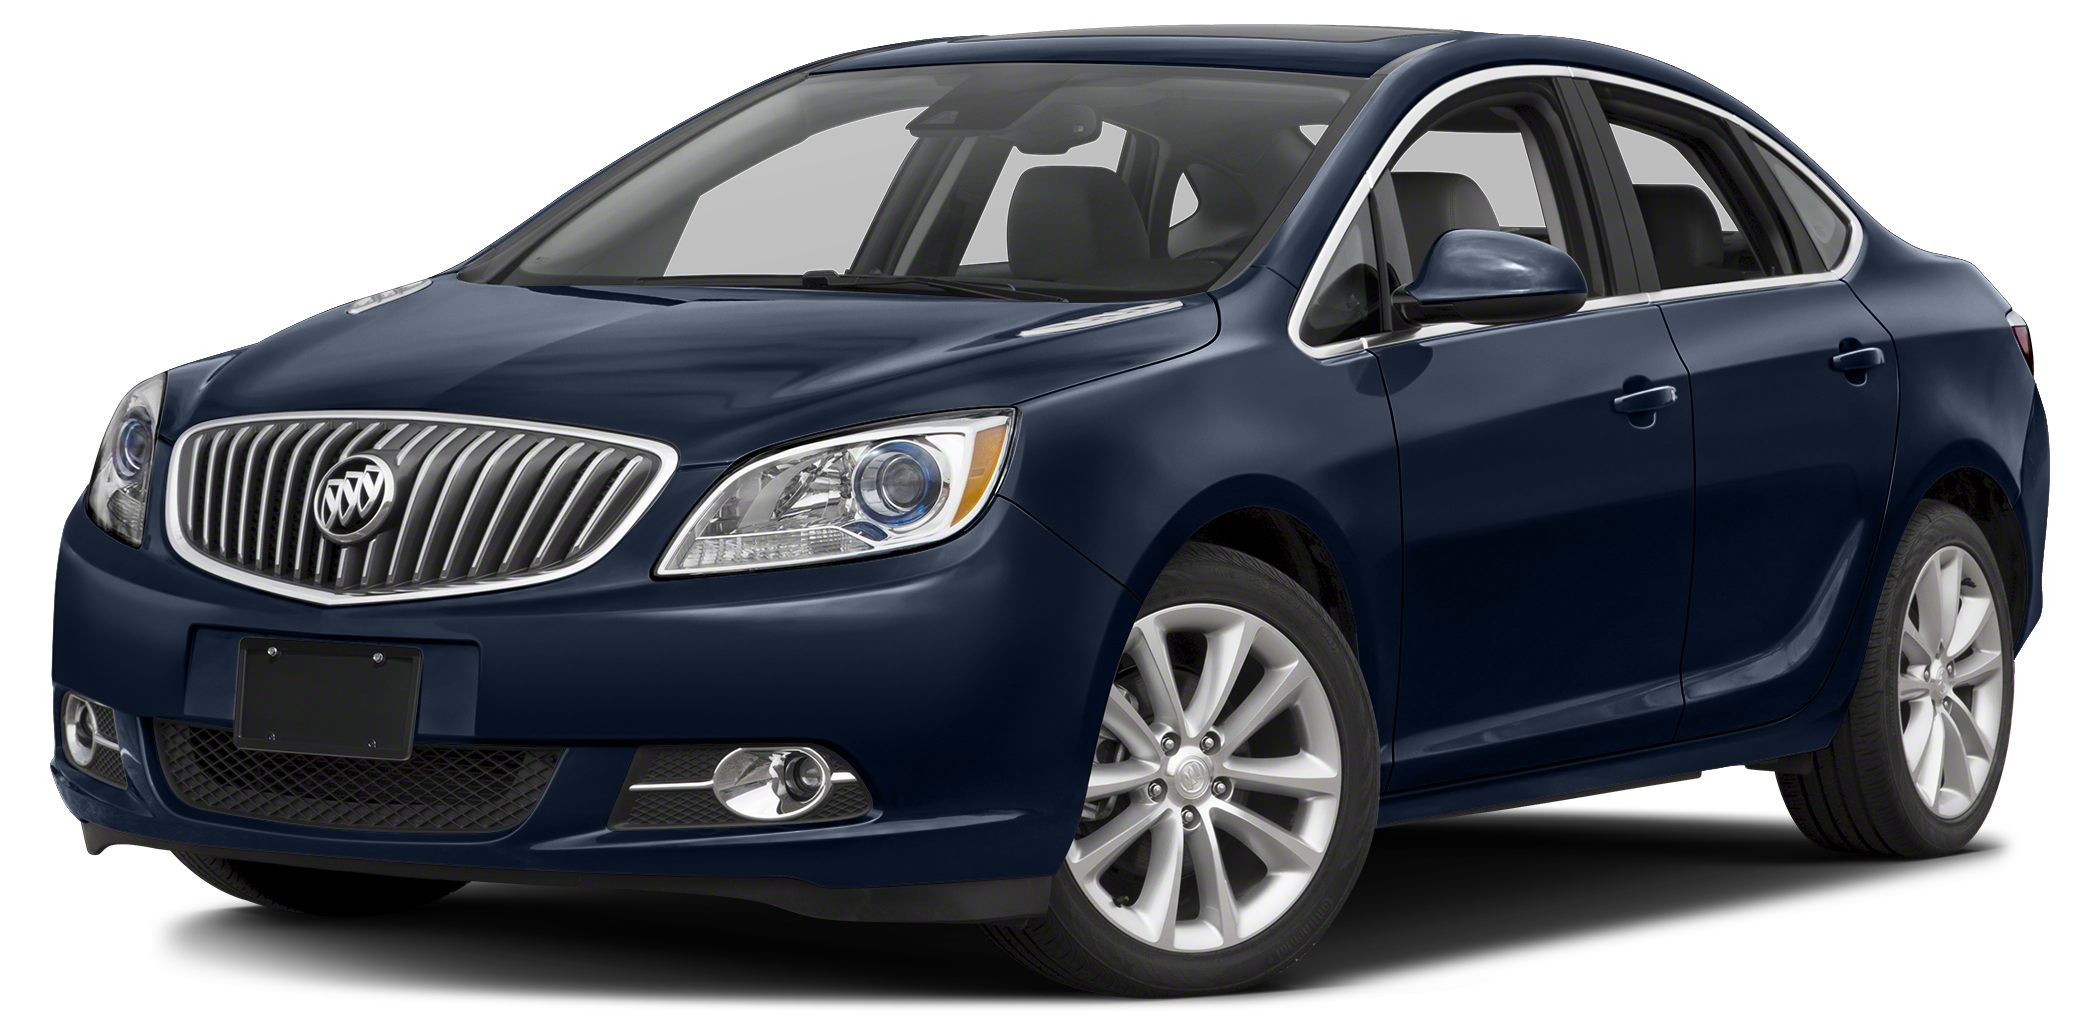 2015 Buick Verano Convenience Group Verano Convenience Group 4D Sedan ECOTEC 24L I4 SIDI DOHC V